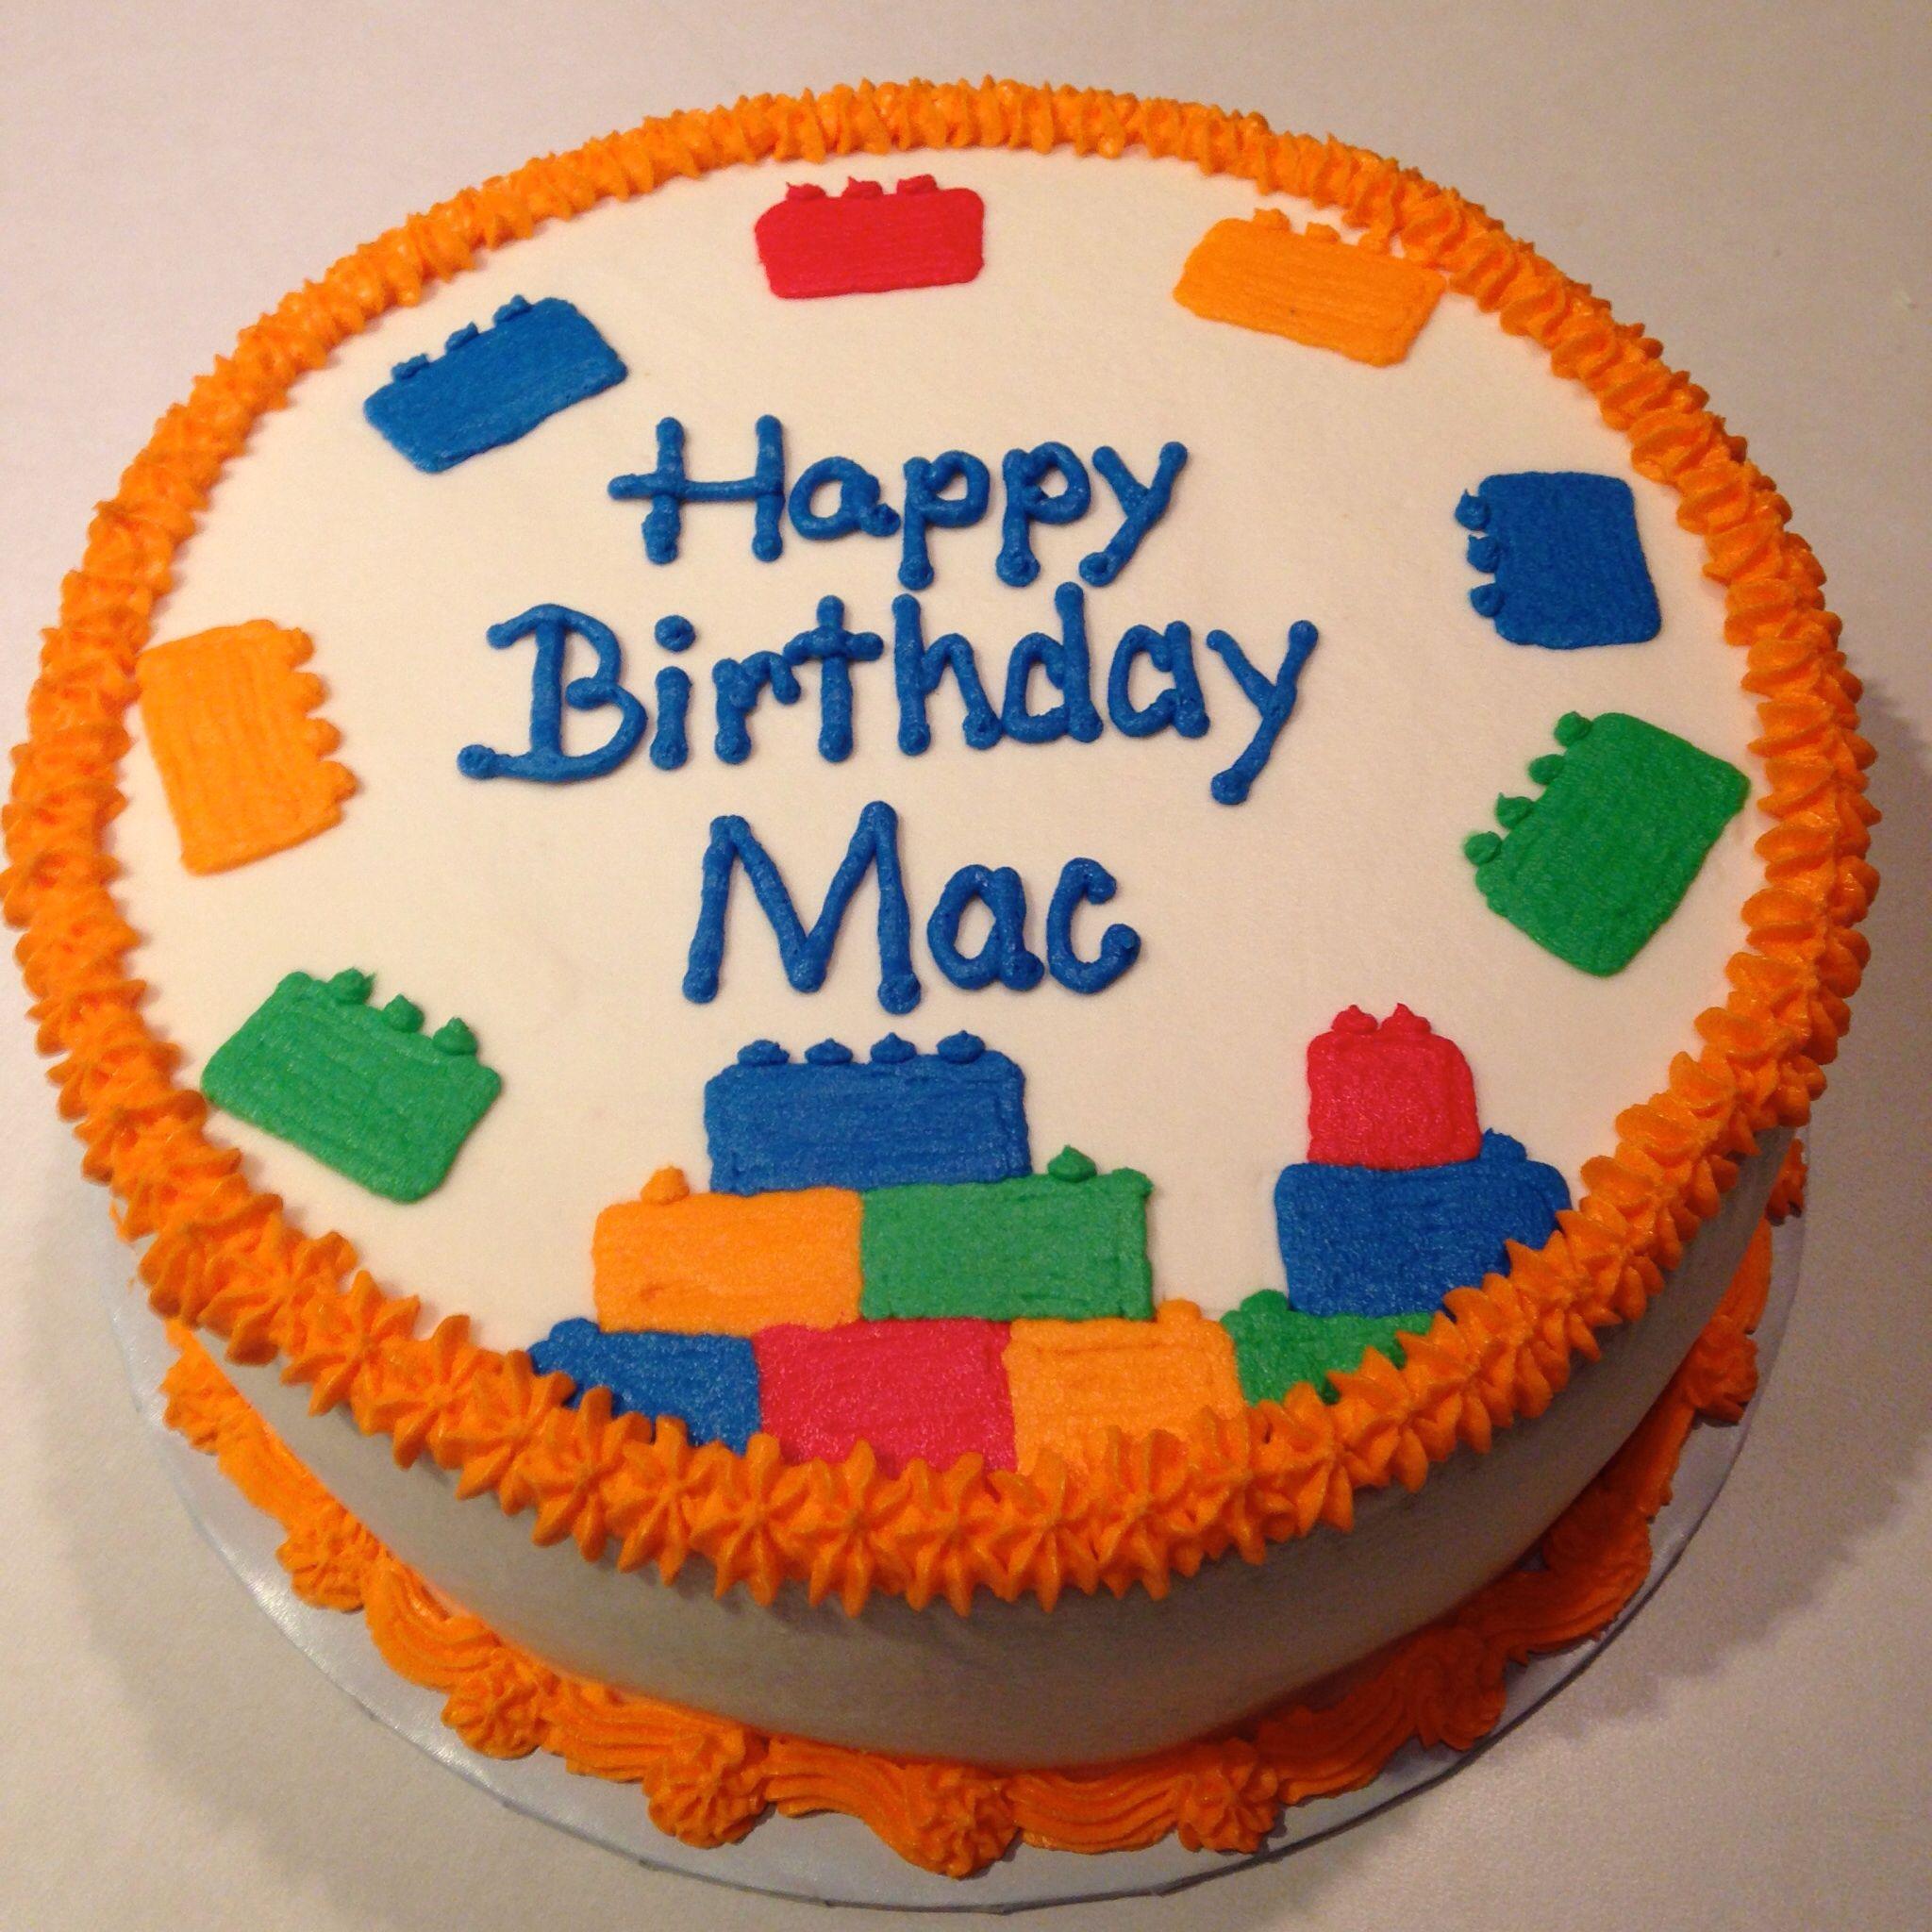 Simple Lego Birthday Cake 70th Birthday Cake Cake Lego Birthday Cake